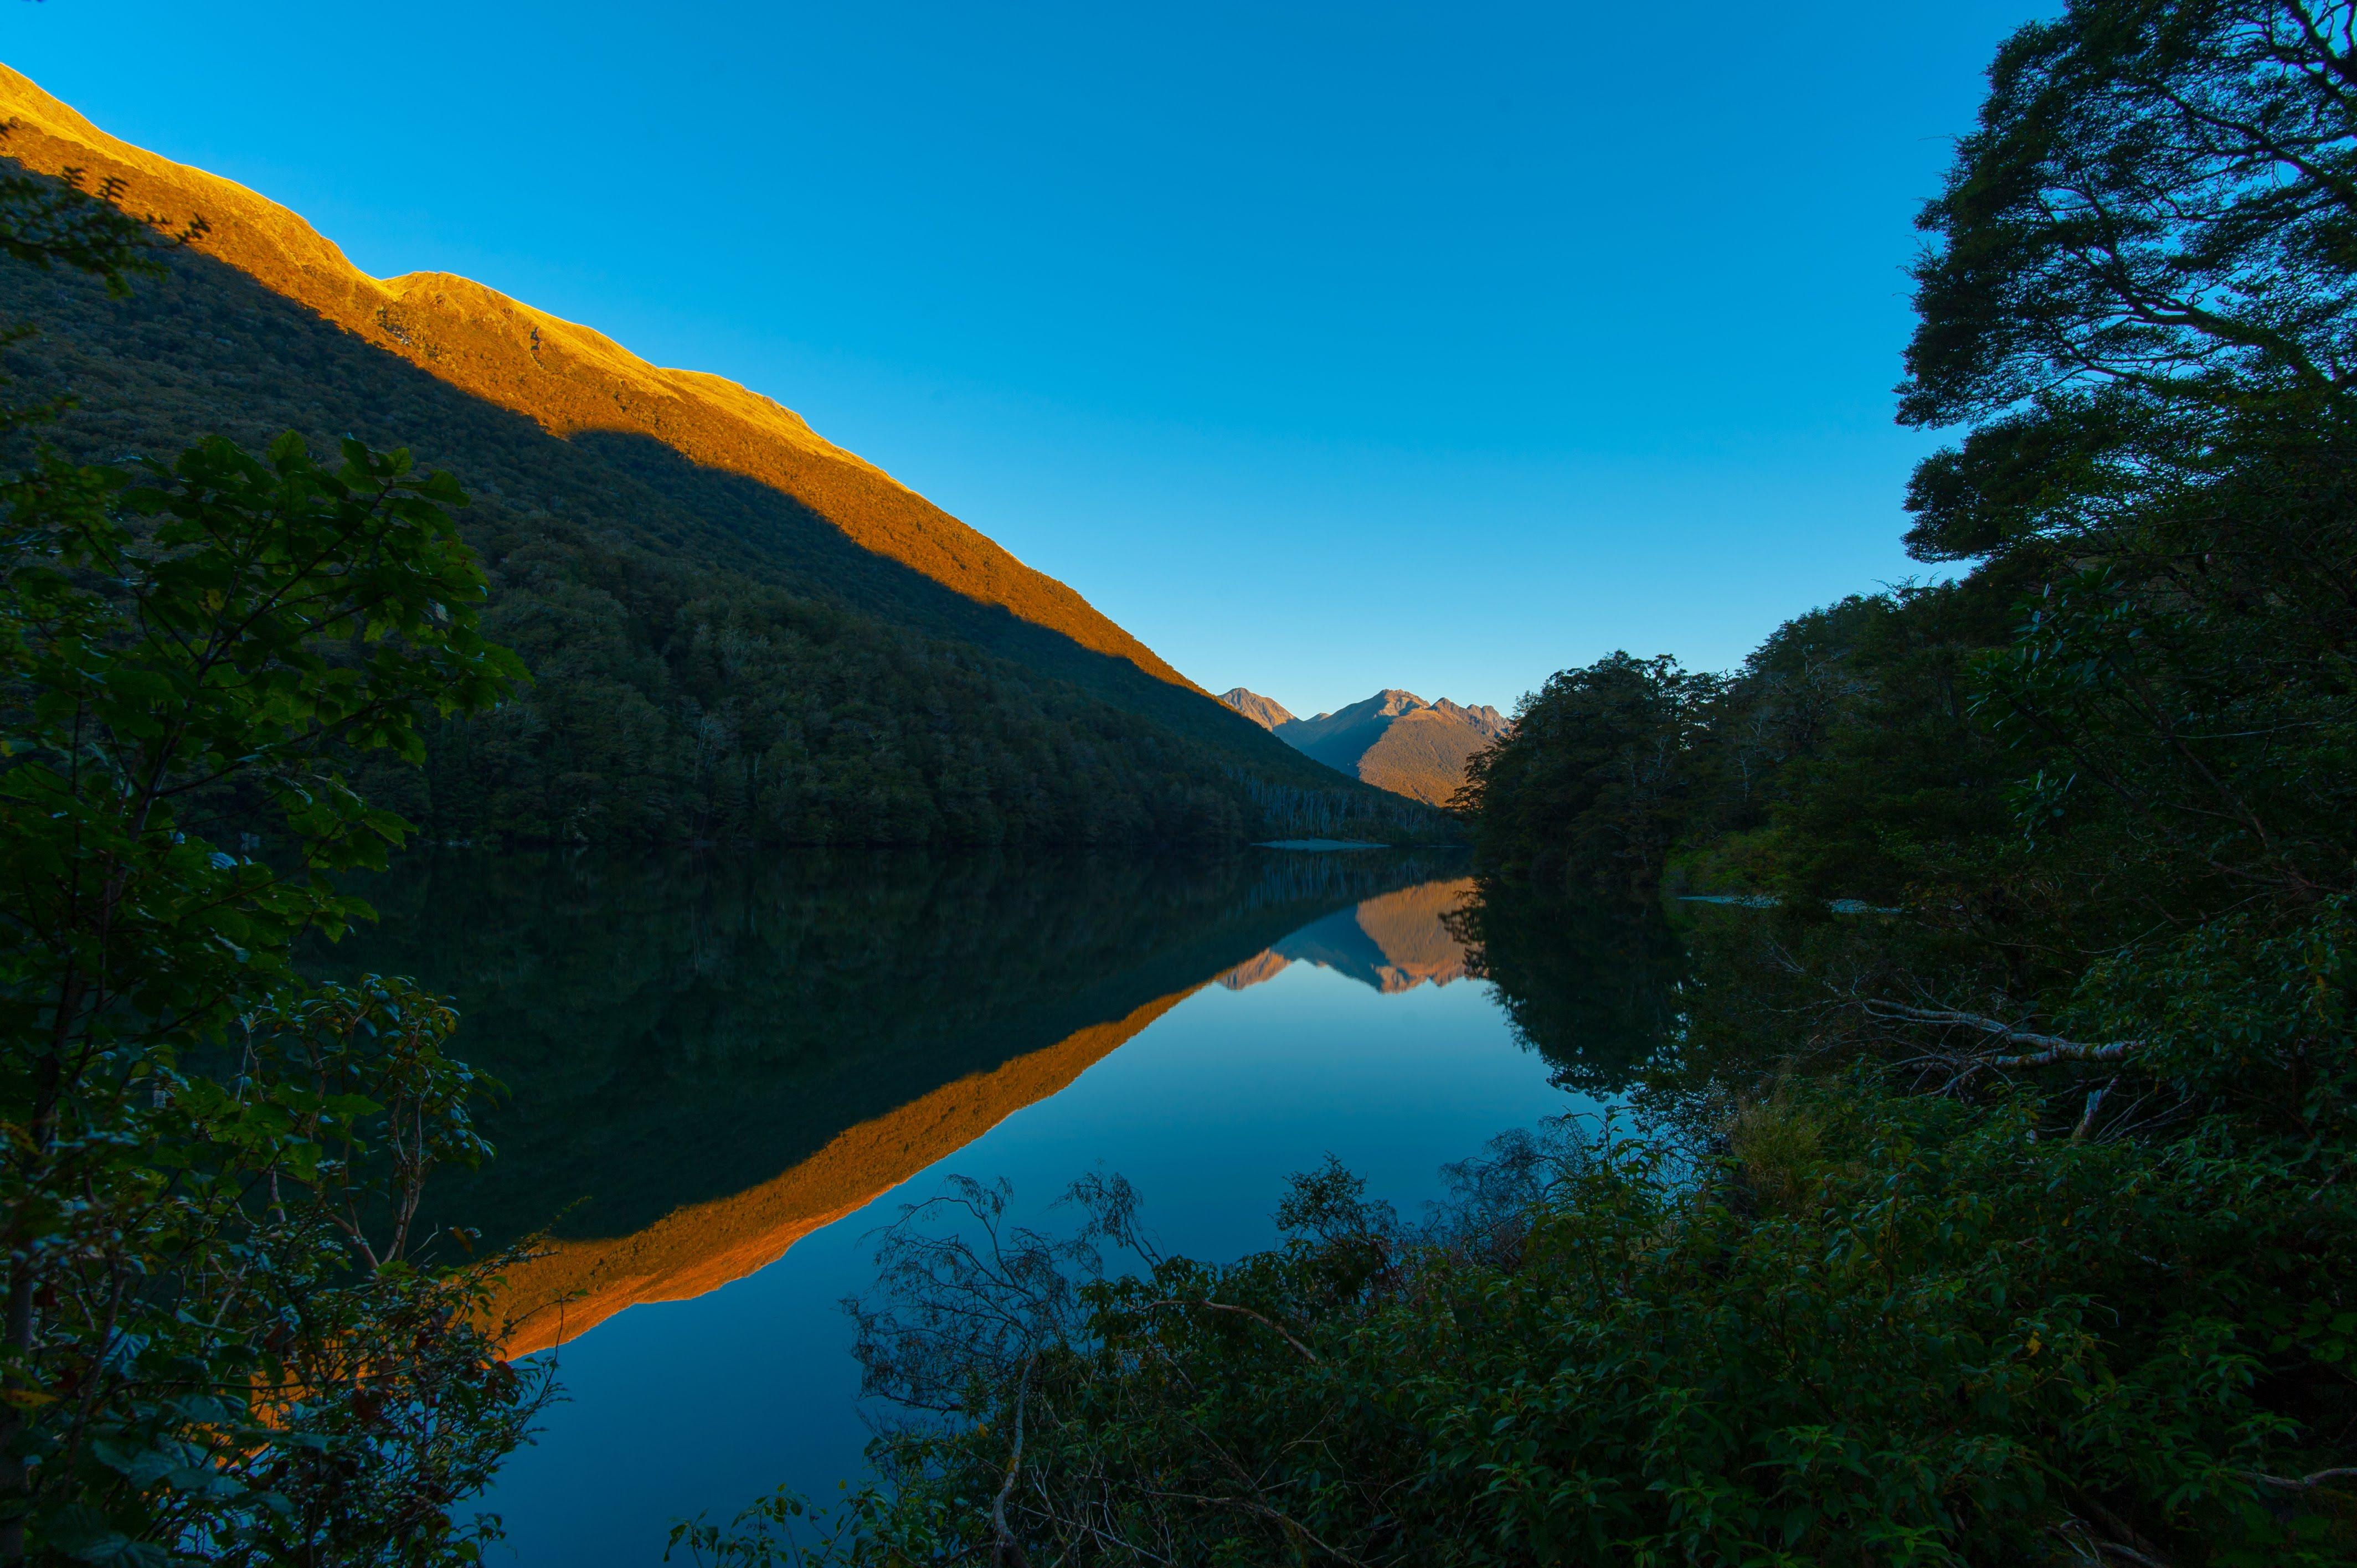 Mountain reflecting in a lake